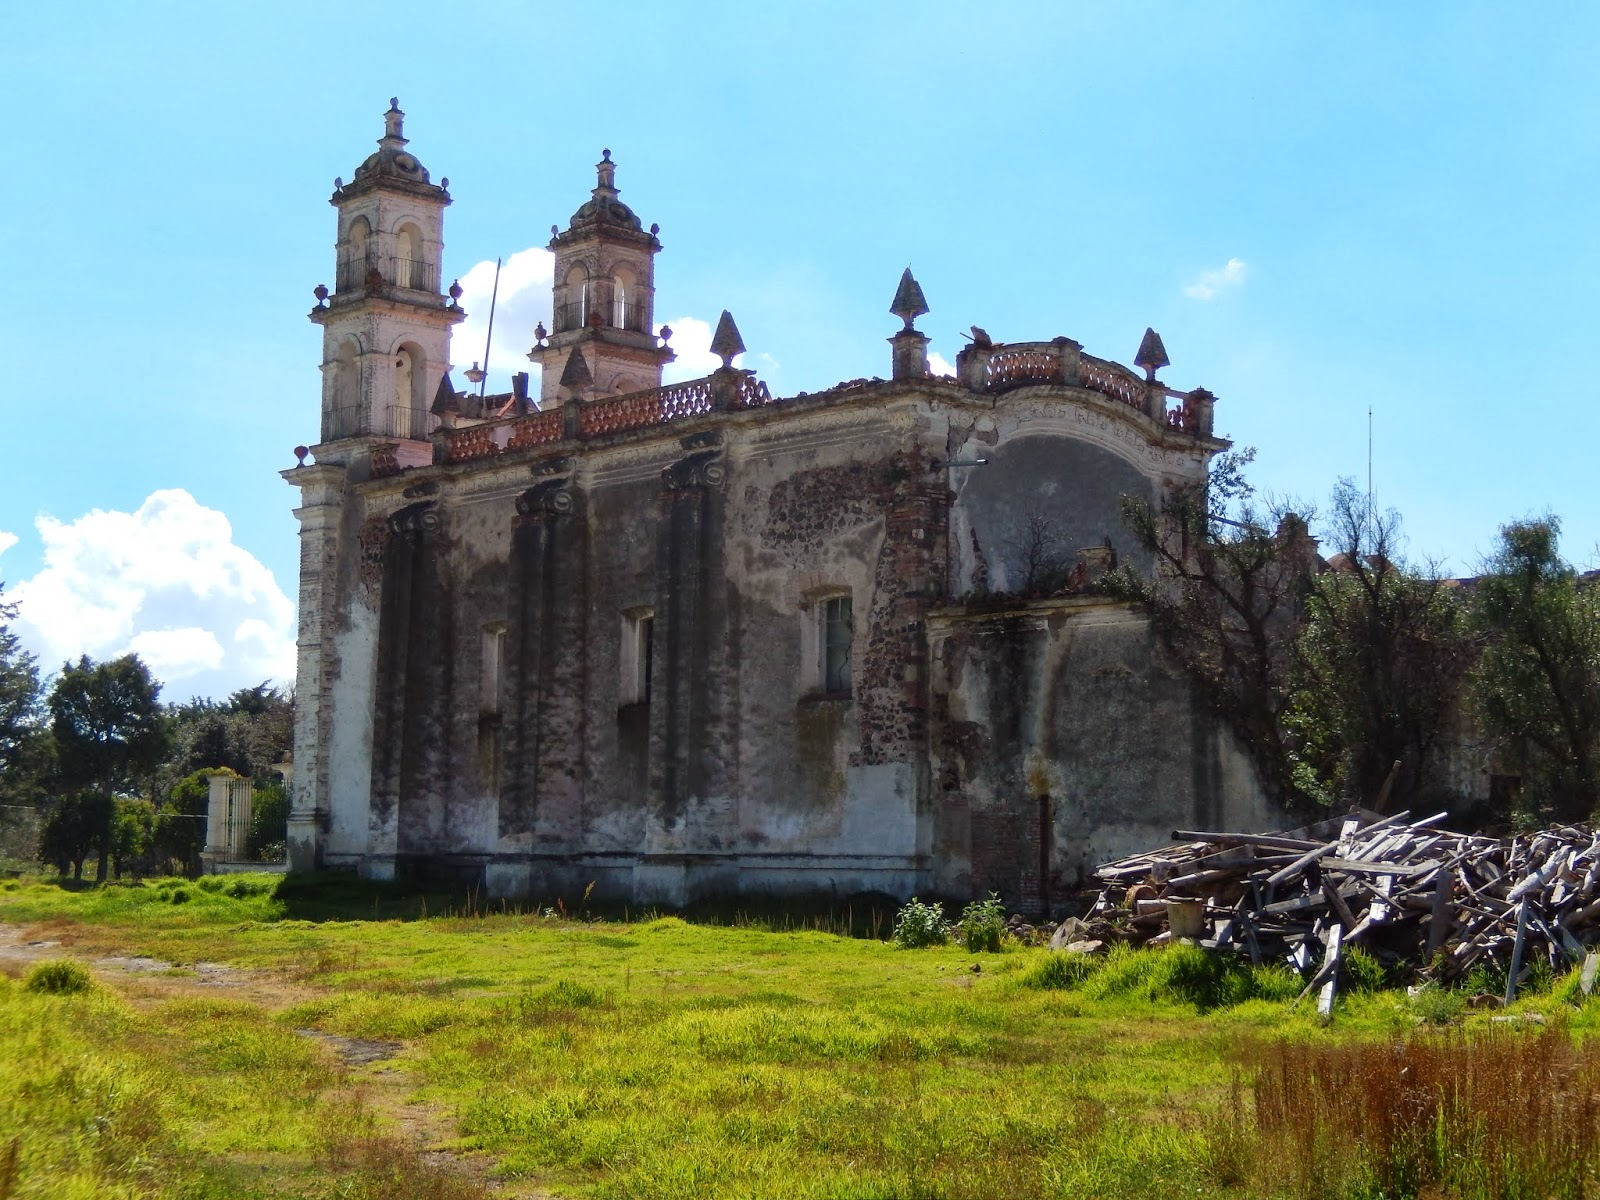 iglesia, ruinas, emiliano zapata, hidalgo, mexico